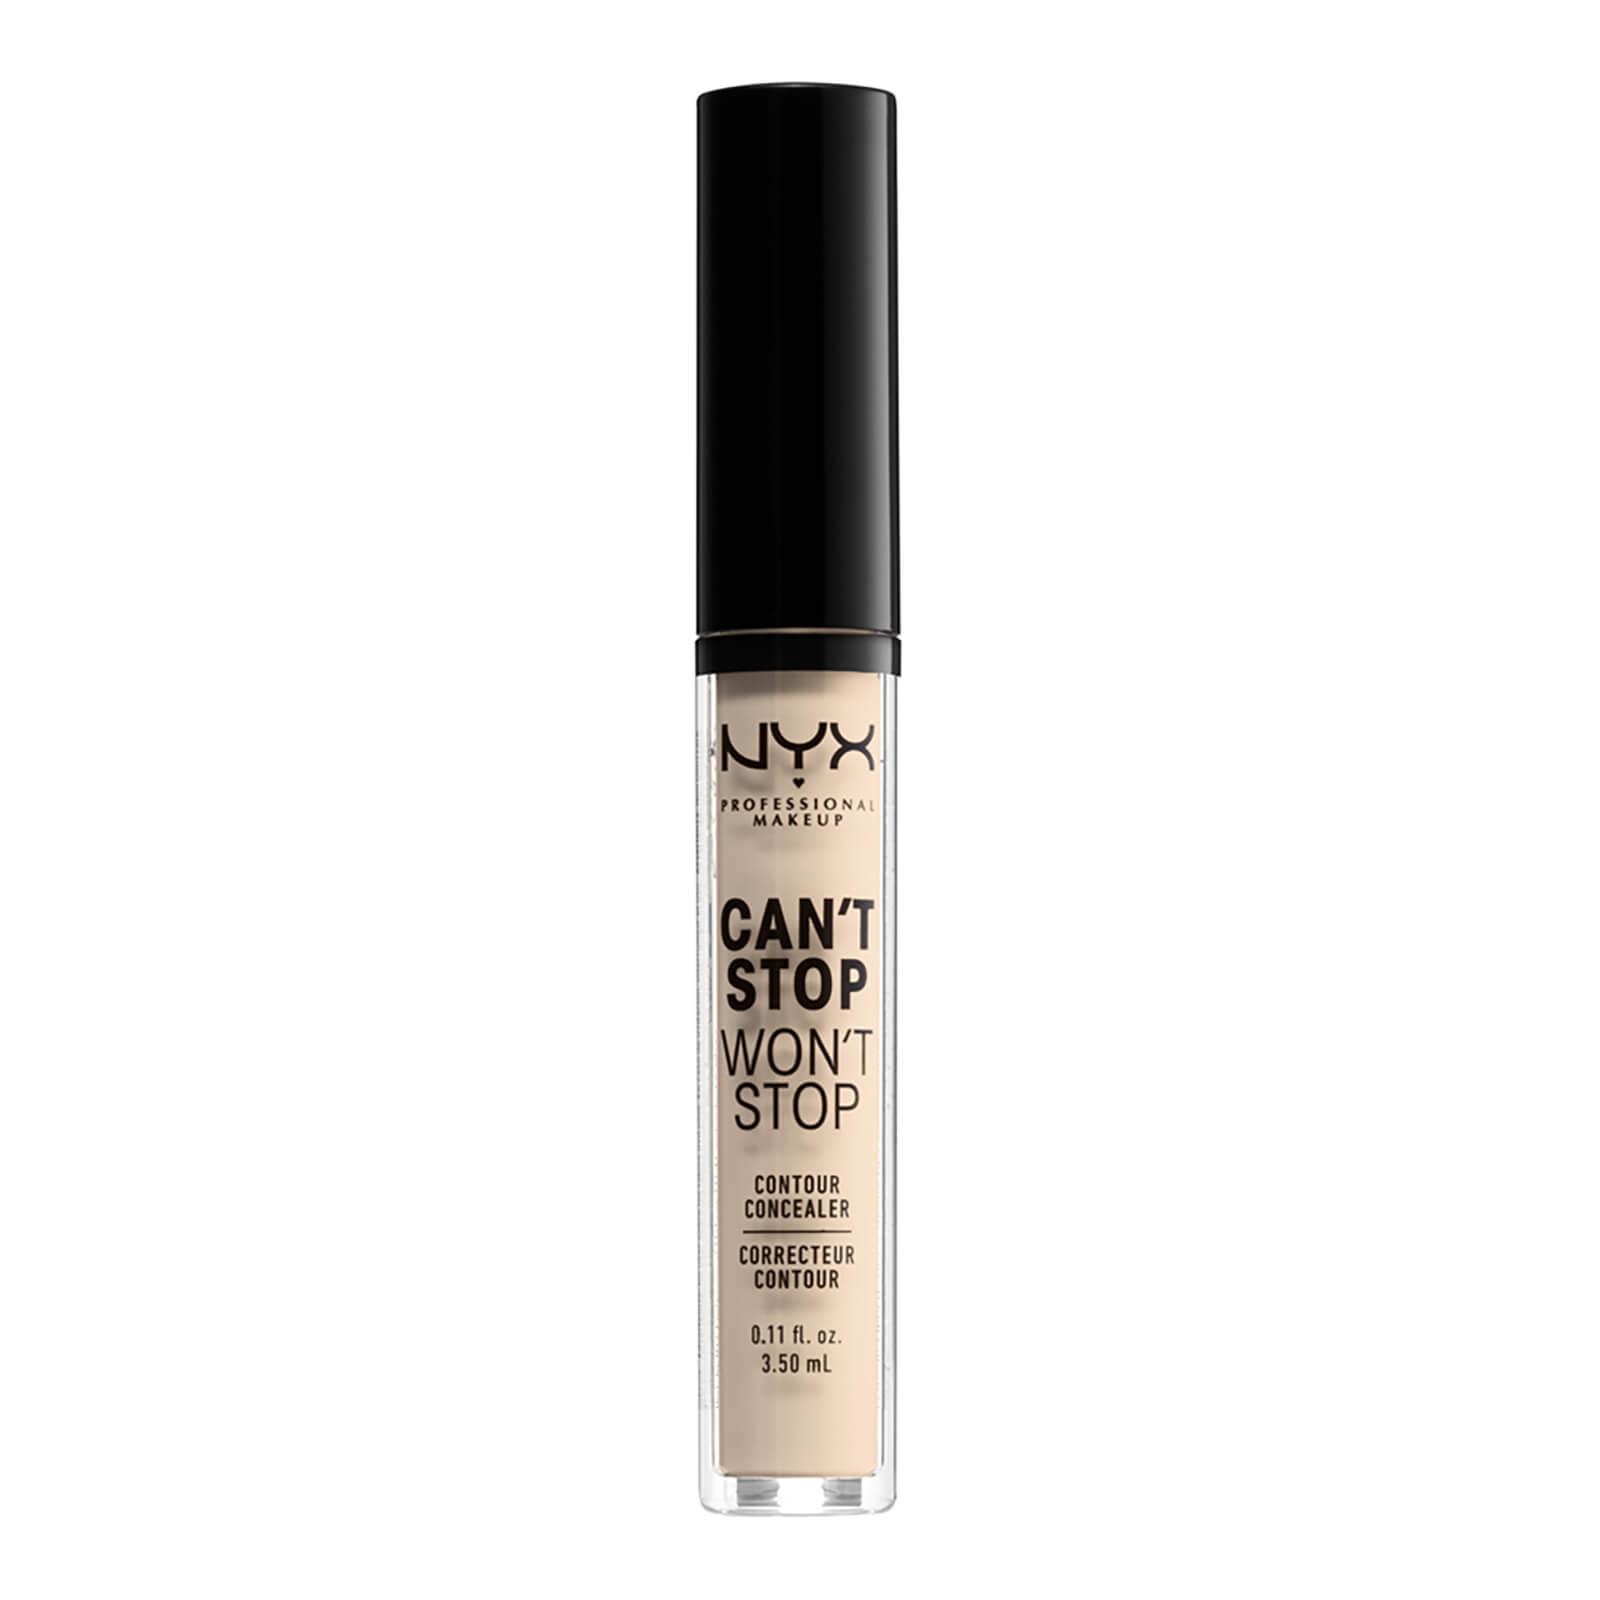 NYX Professional Makeup Can't Stop Won't Stop Contour Concealer (Various Shades) - Fair